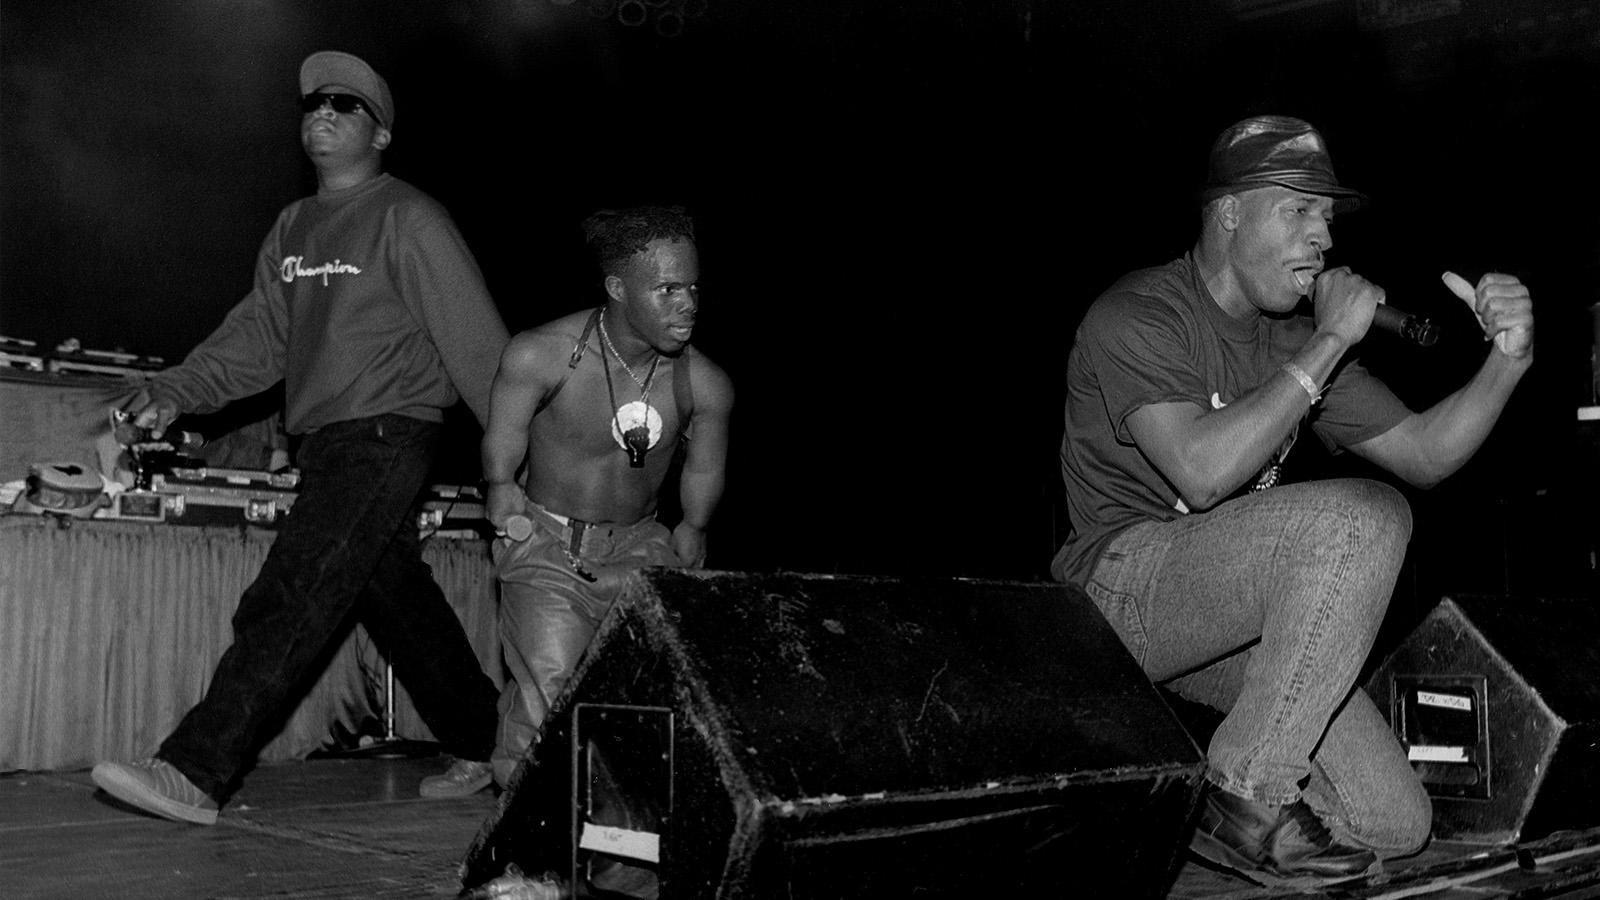 Bushwick Bill, Geto Boys Rapper and Horrorcore Godfather, Dead at 52